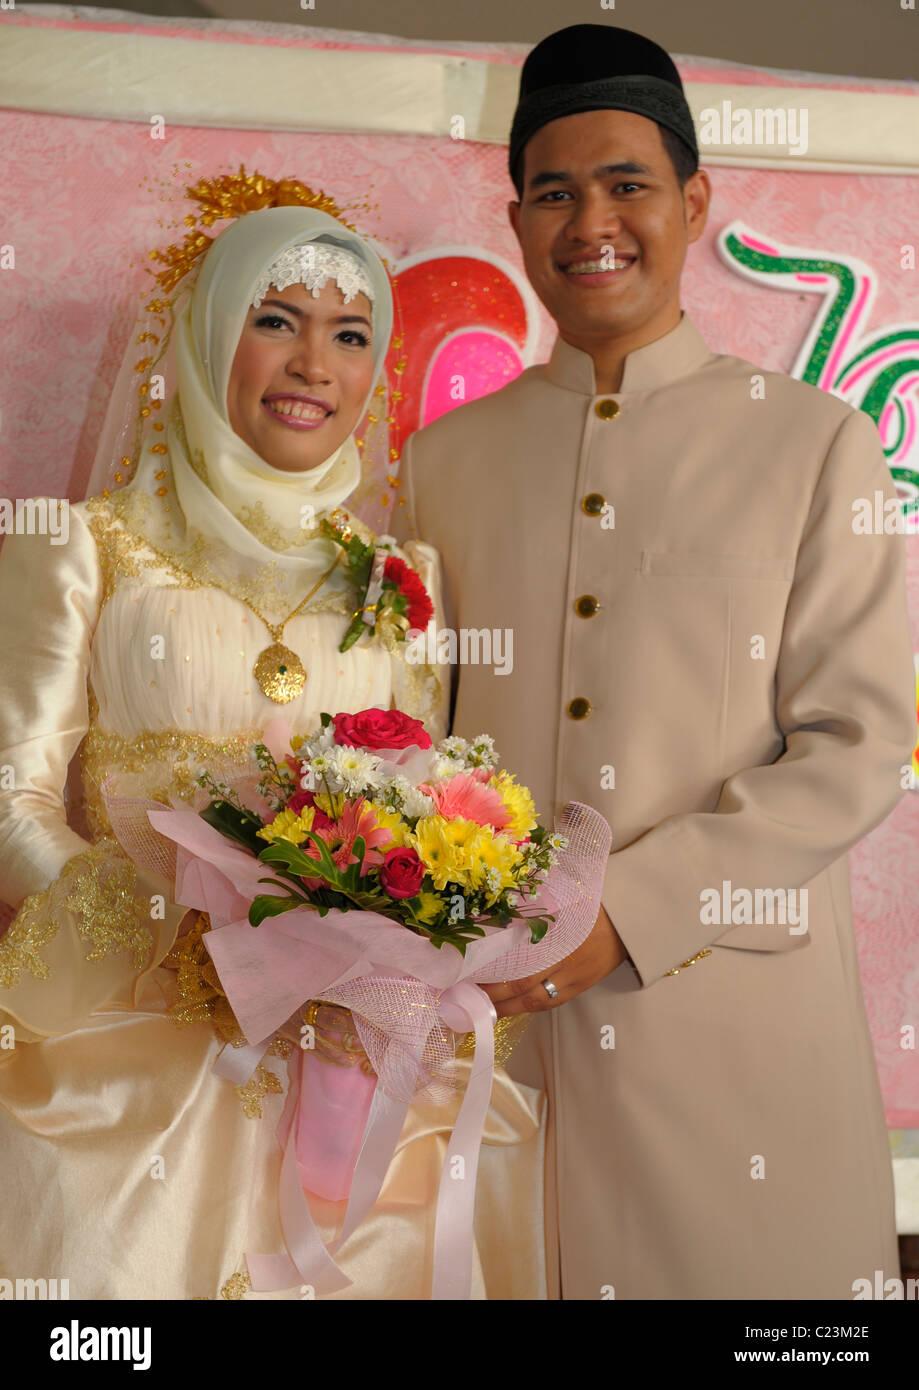 bride and groom , islamic wedding , muslim community , bangkok, thailand - Stock Image